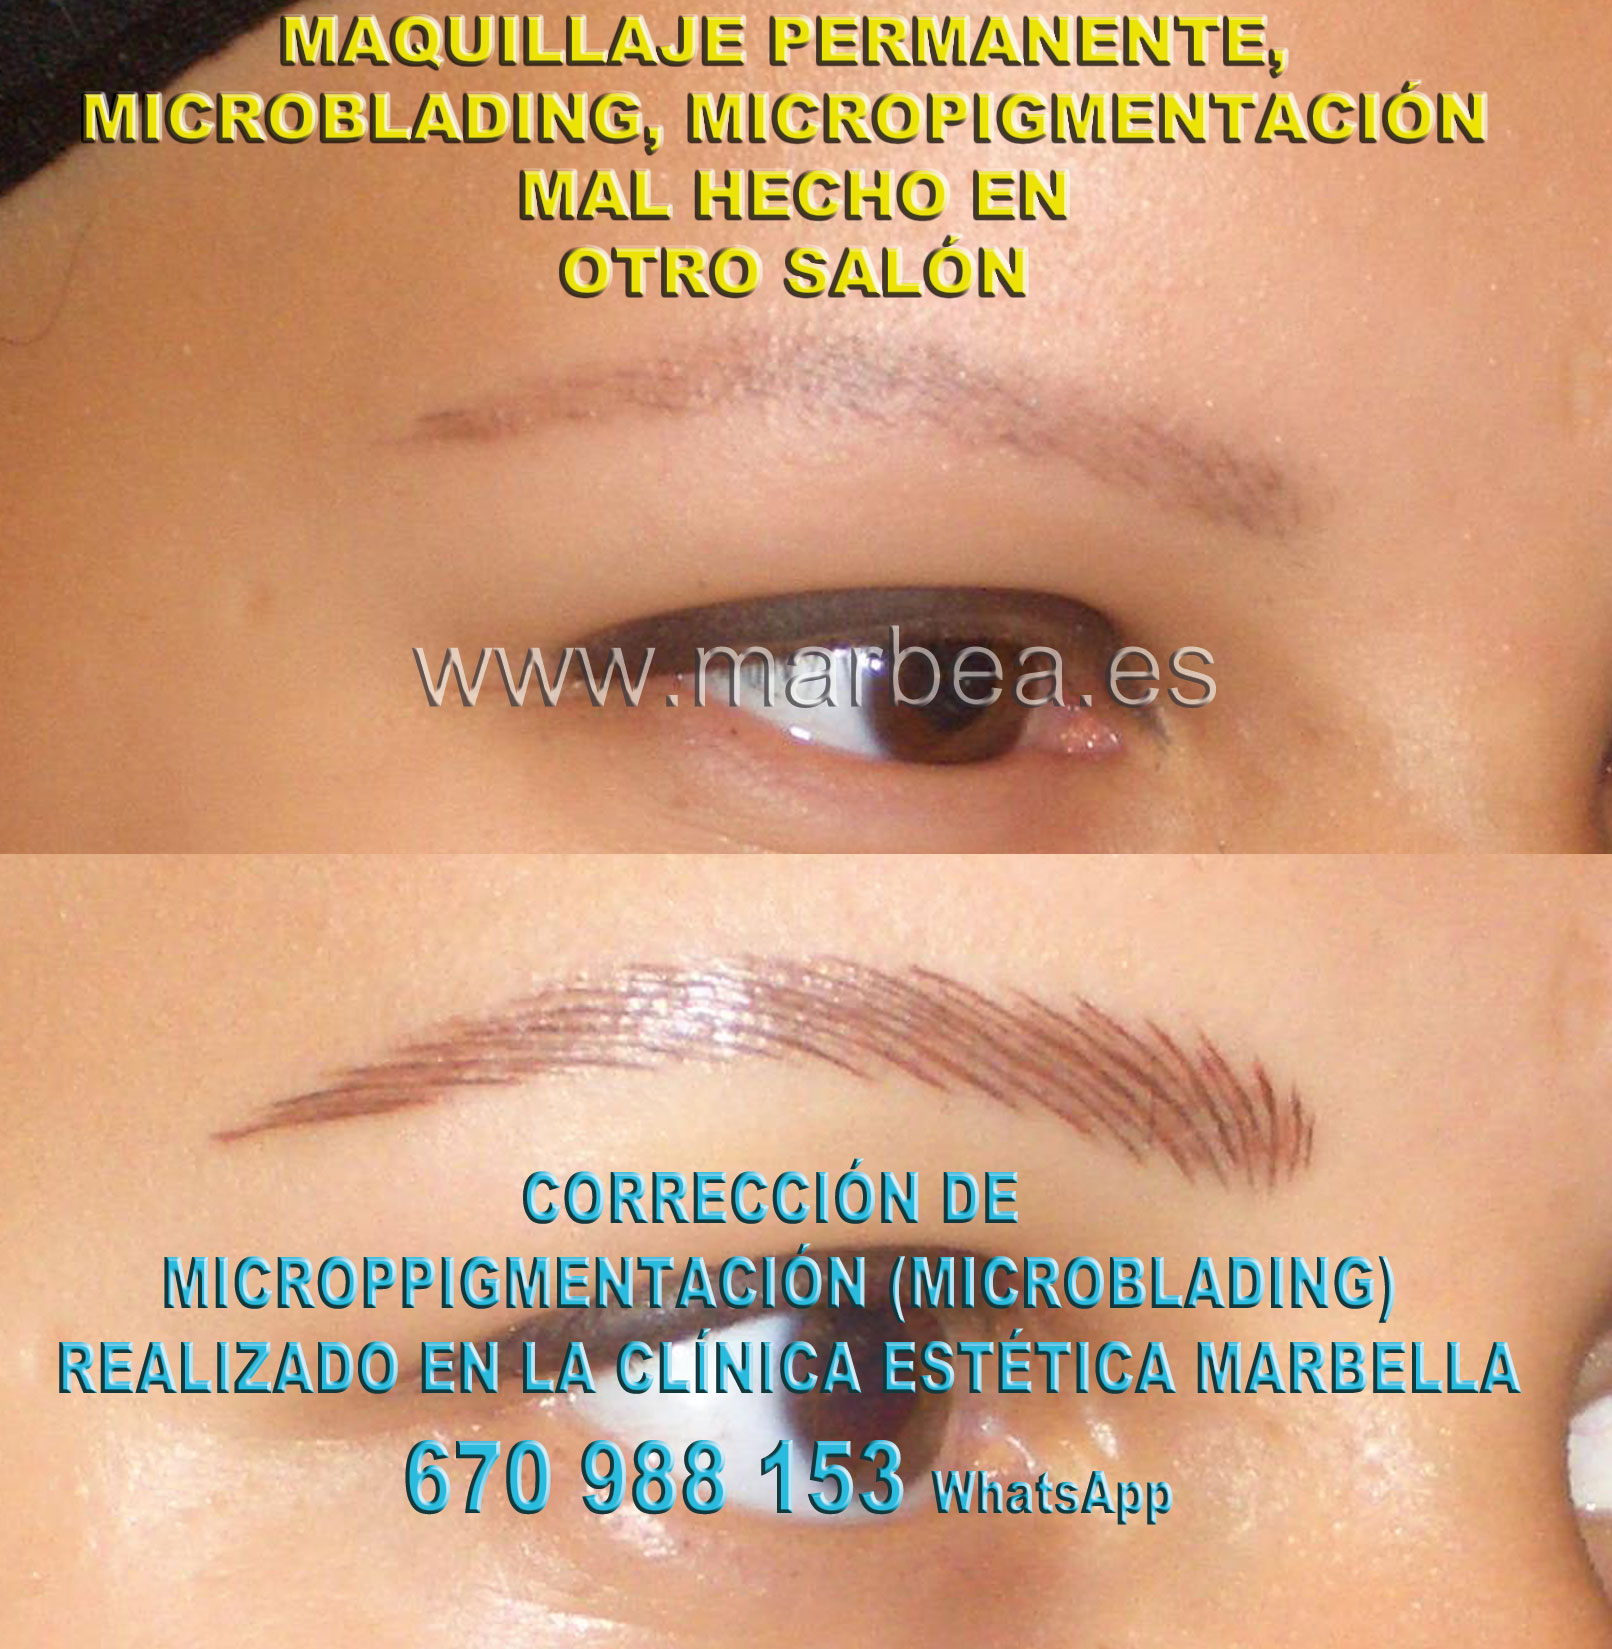 ELIMINAR TATUAJE CEJAS clínica estética microblading ofrenda micropigmentacion correctiva de cejas,corregir micropigmentación mal hecha